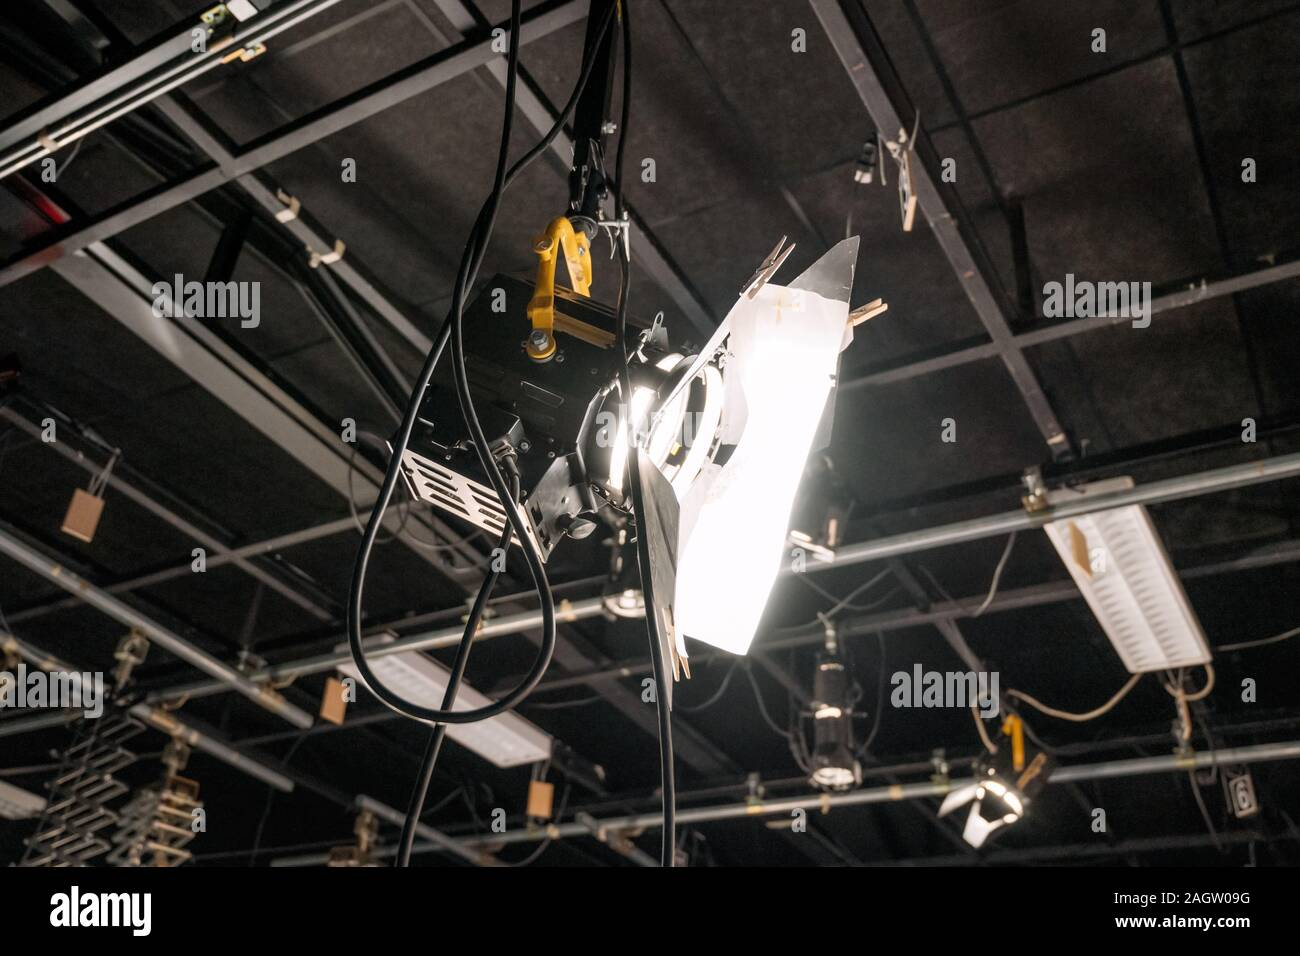 https www alamy com tv studio lights the ceiling of a tv studio with the lighting equipment image337380556 html